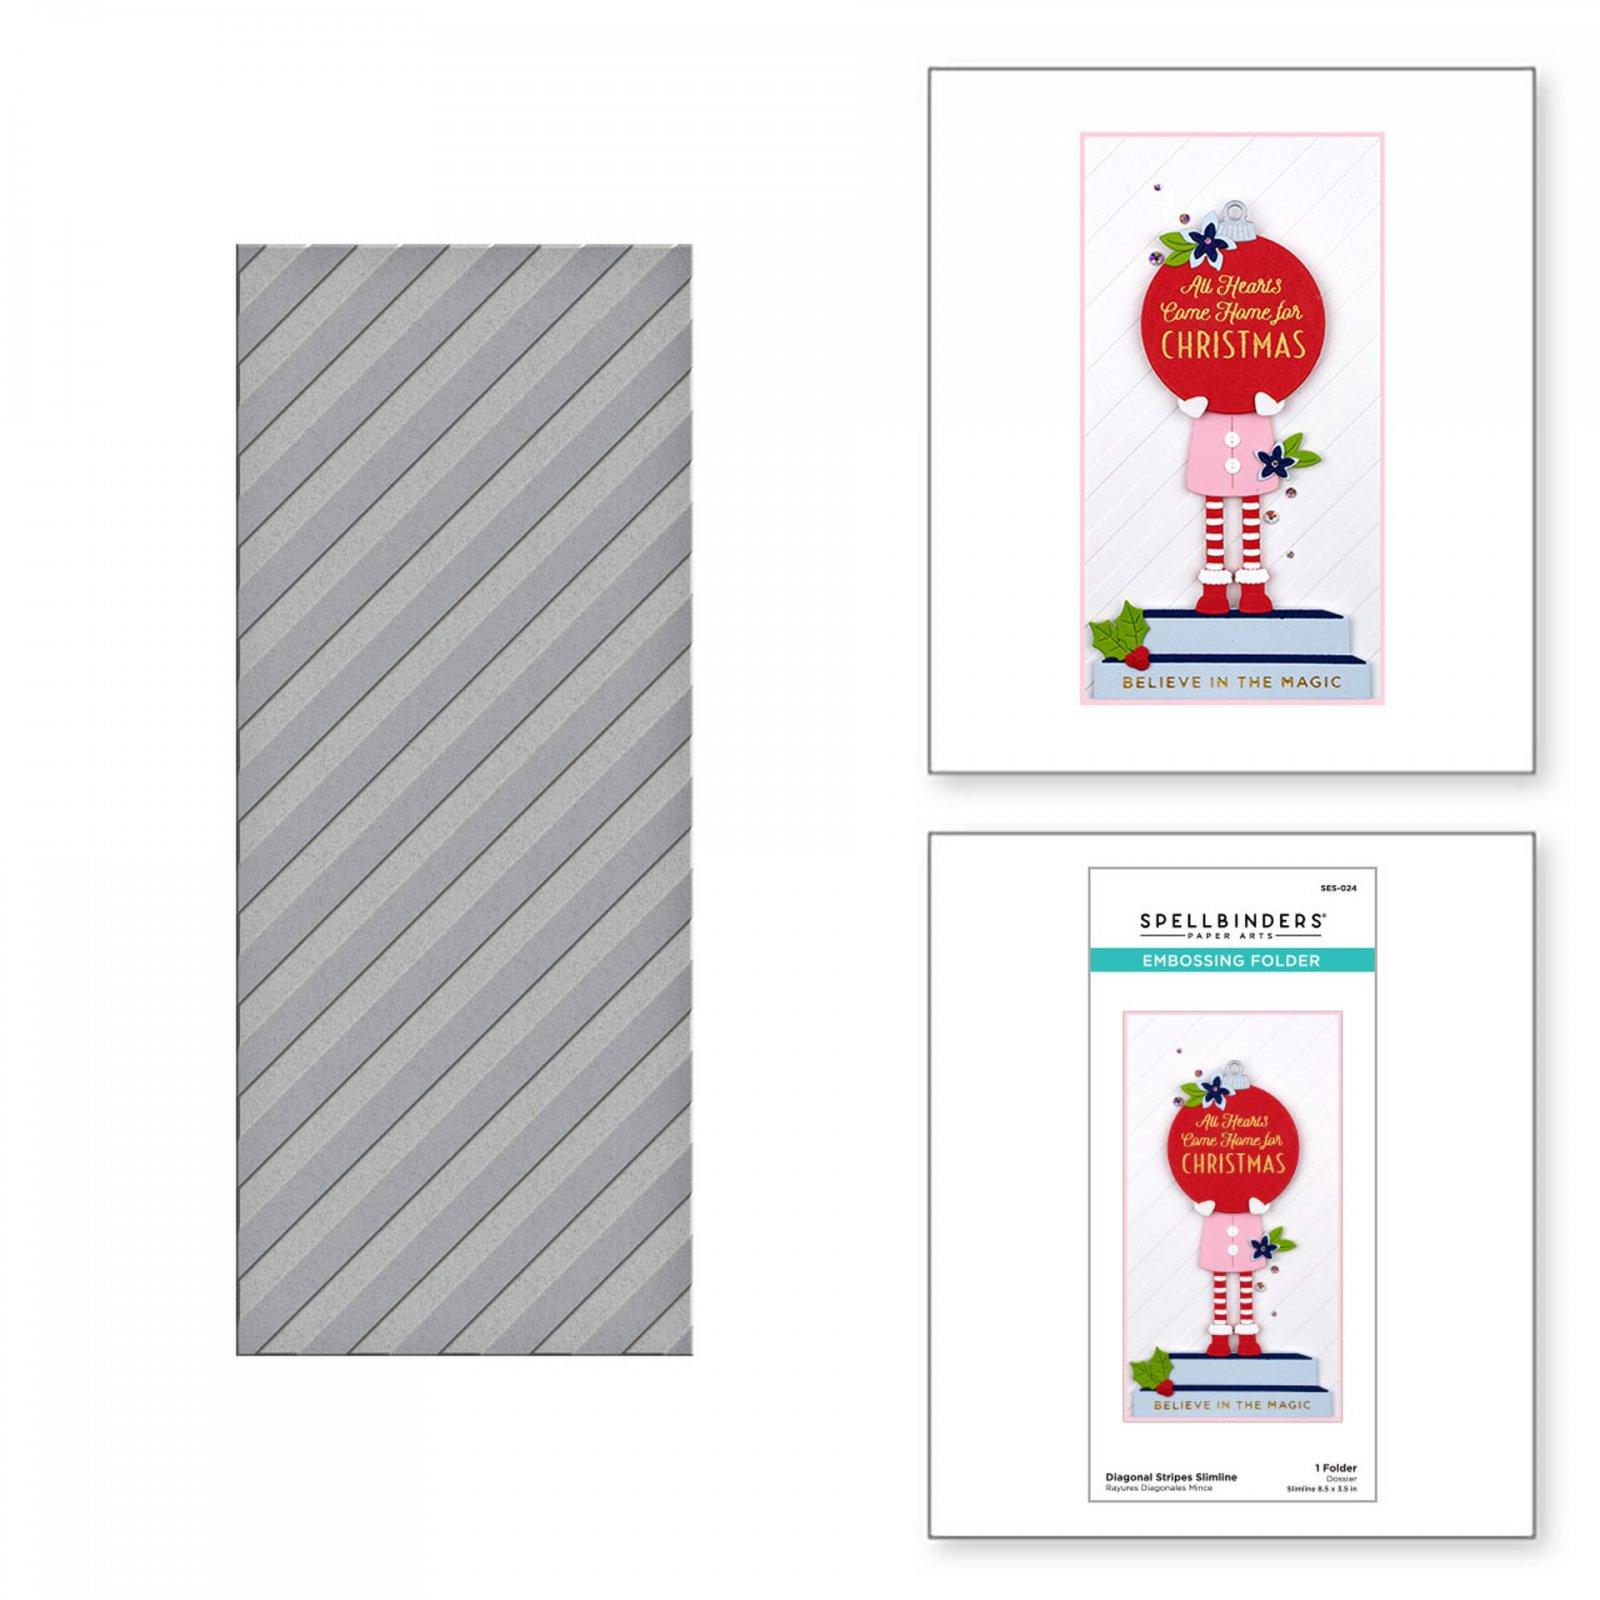 Spellbinders - Embossing Folder - Diagonal Stripes Slimline